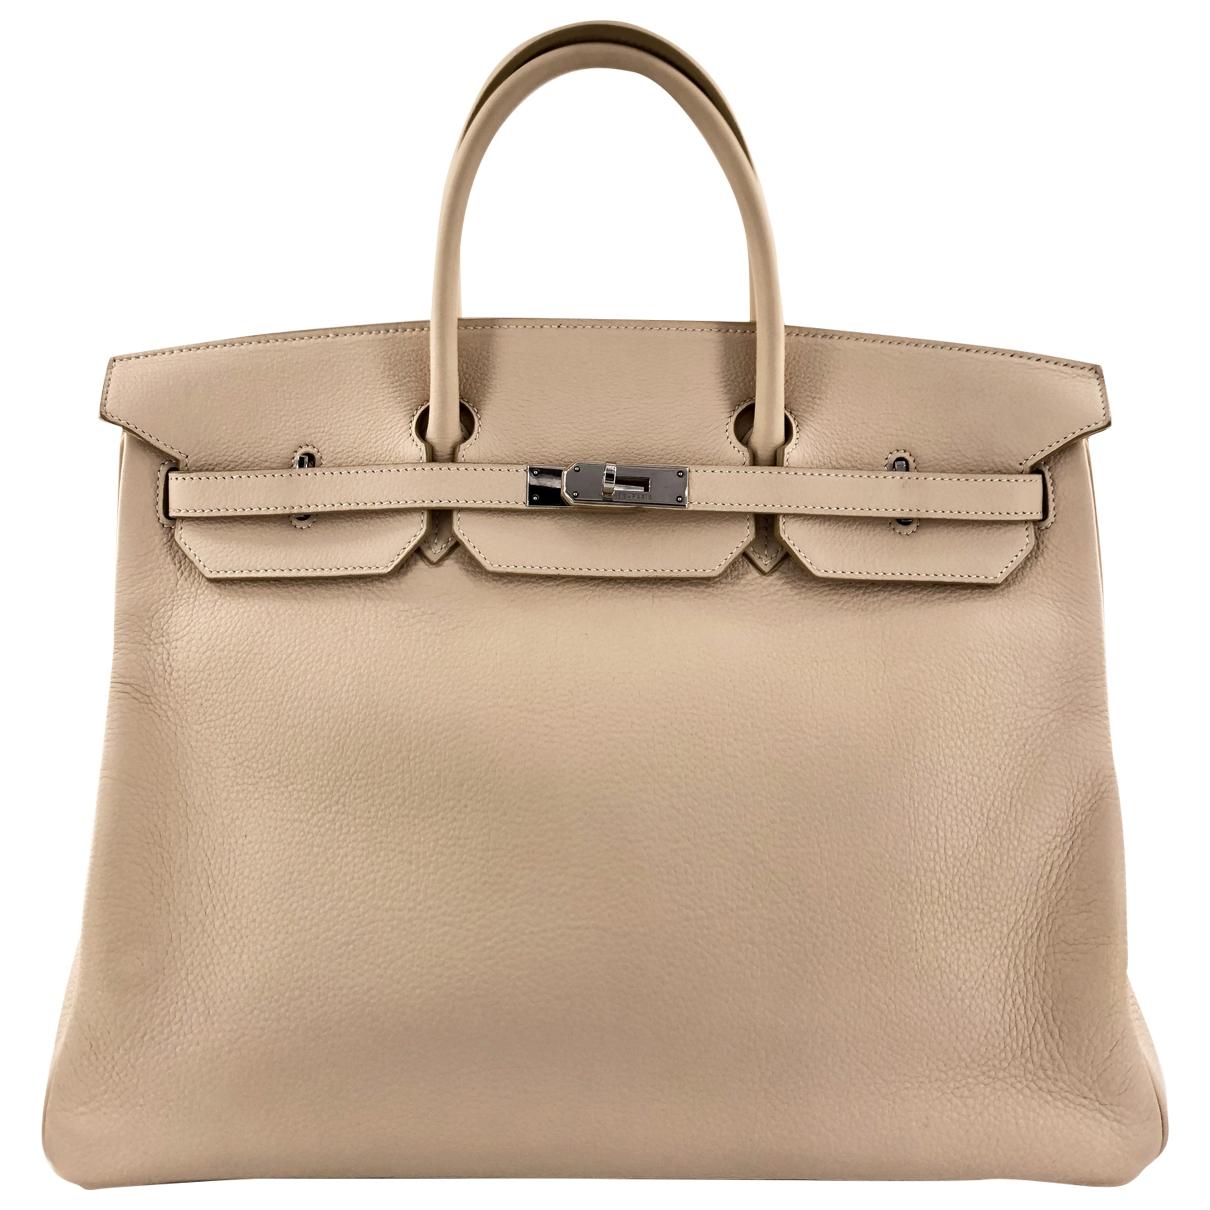 Hermes - Sac a main Birkin 40 pour femme en cuir - beige